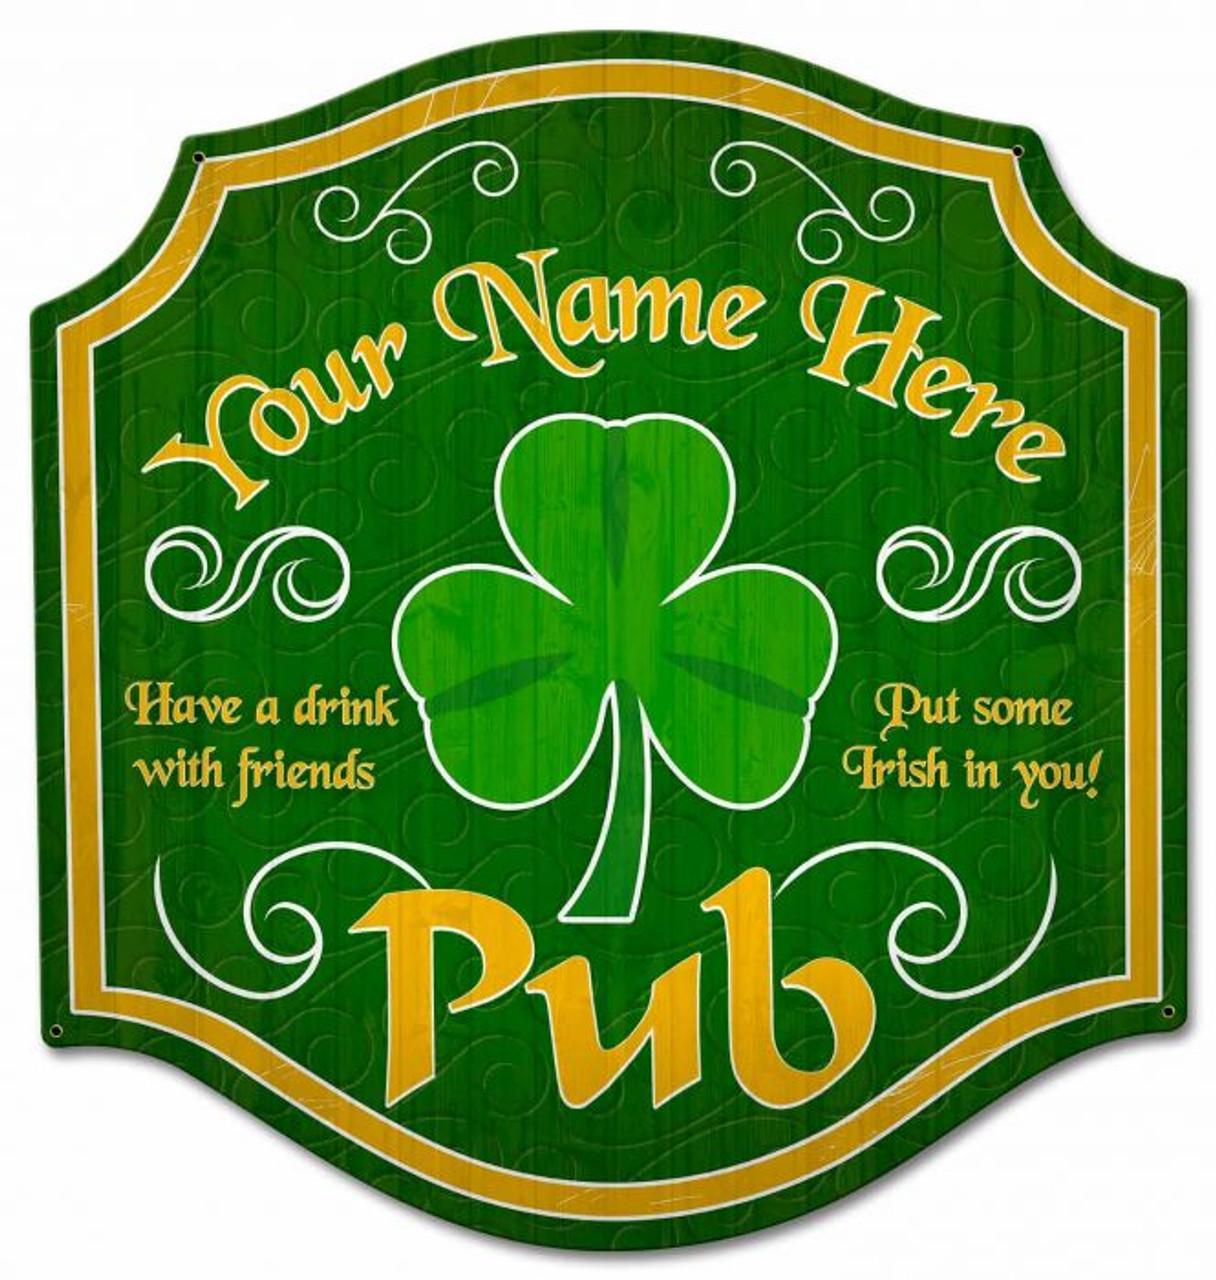 Irish Pub Metal Sign - Personalized  20 x 21 Inches